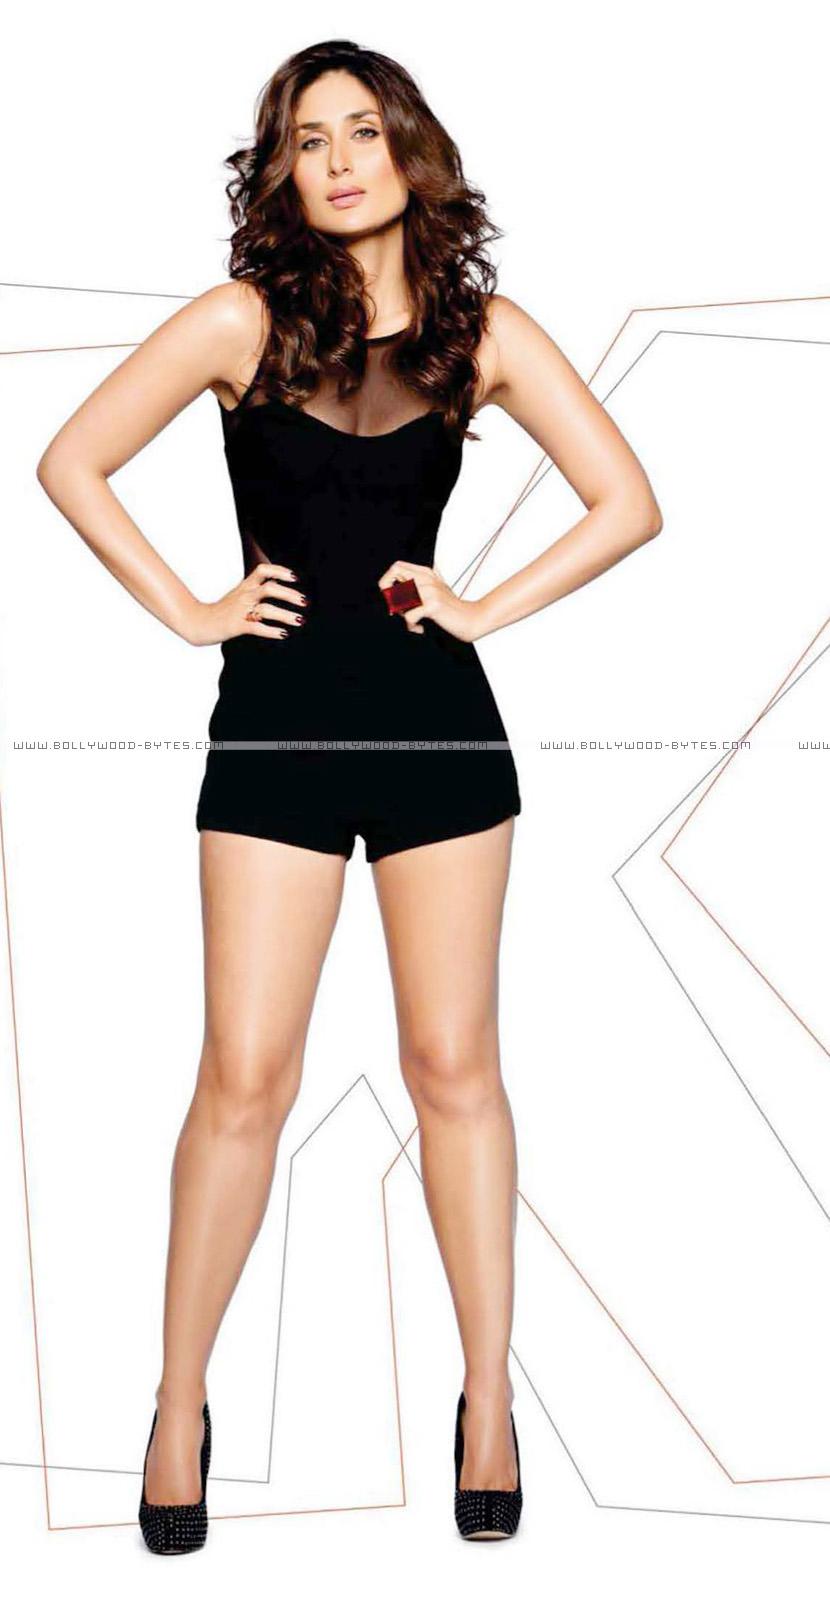 Kareena Kapoor's Super Hot Photoshoot Pics in Black dress